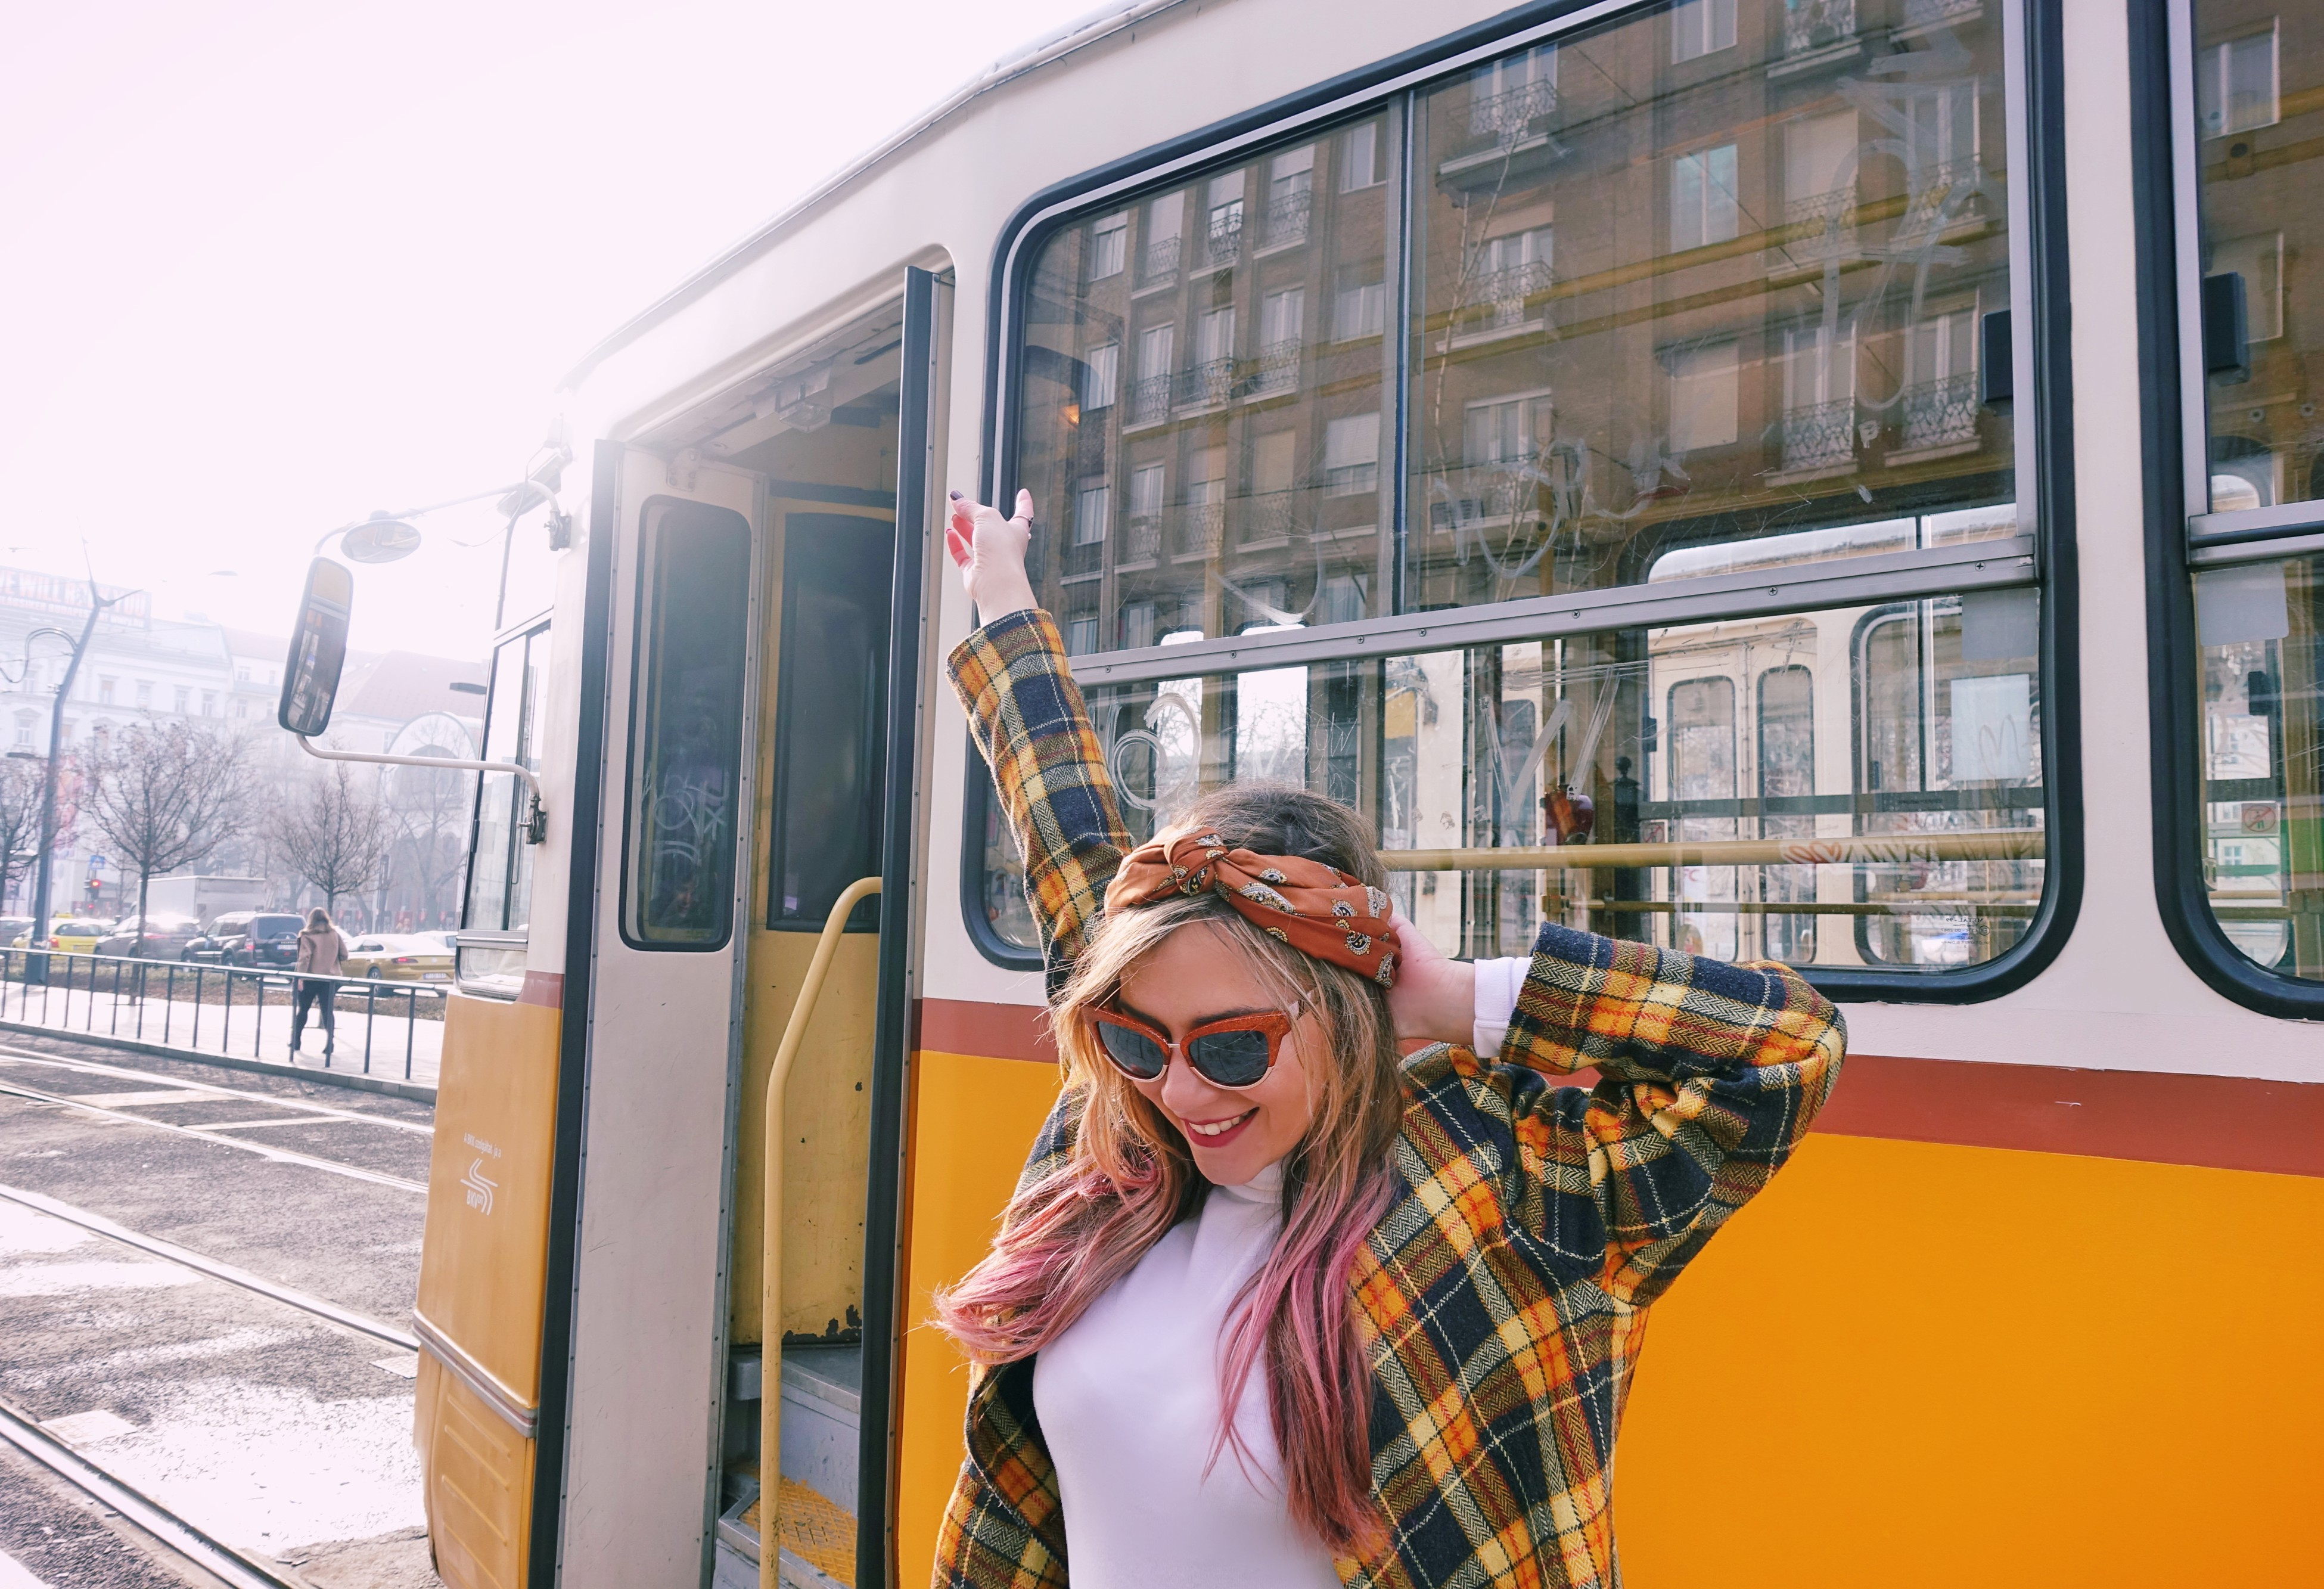 Americana-de-cuadros-vintage-blog-de-moda-fashion-travel-budapest-ChicAdicta-influencer-Chic-Adicta-gafas-retro-PiensaenChic-Piensa-en-Chic